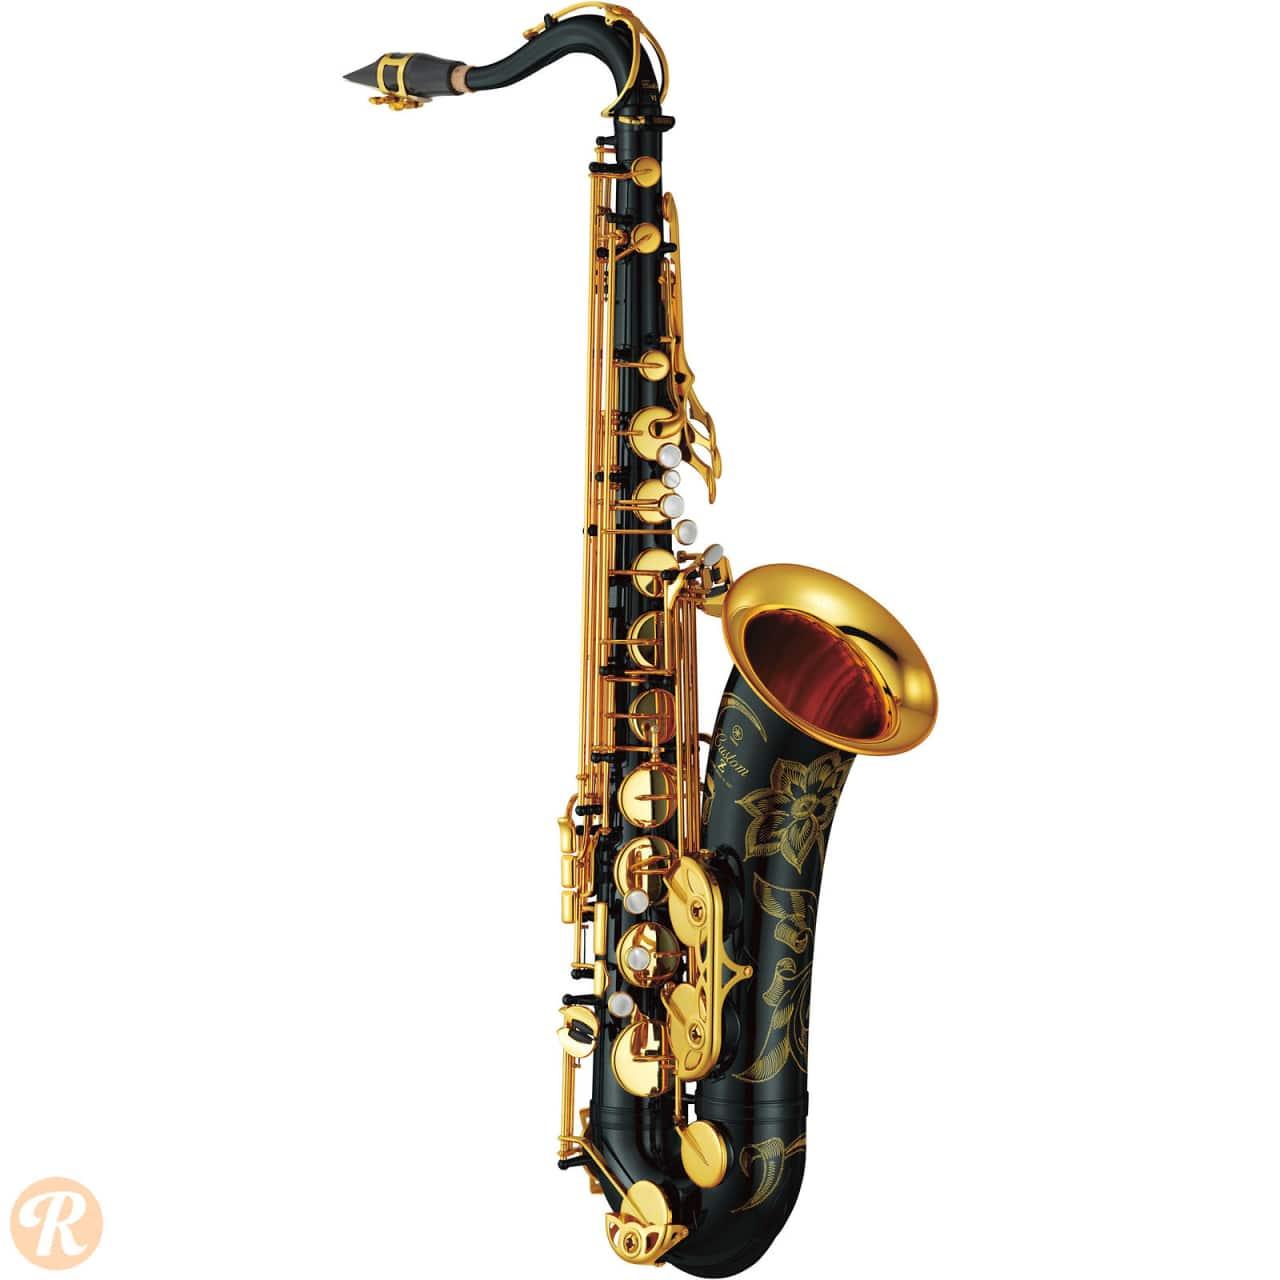 yamaha yts 82ziib tenor saxophone 2010s black lacquer price reverb. Black Bedroom Furniture Sets. Home Design Ideas